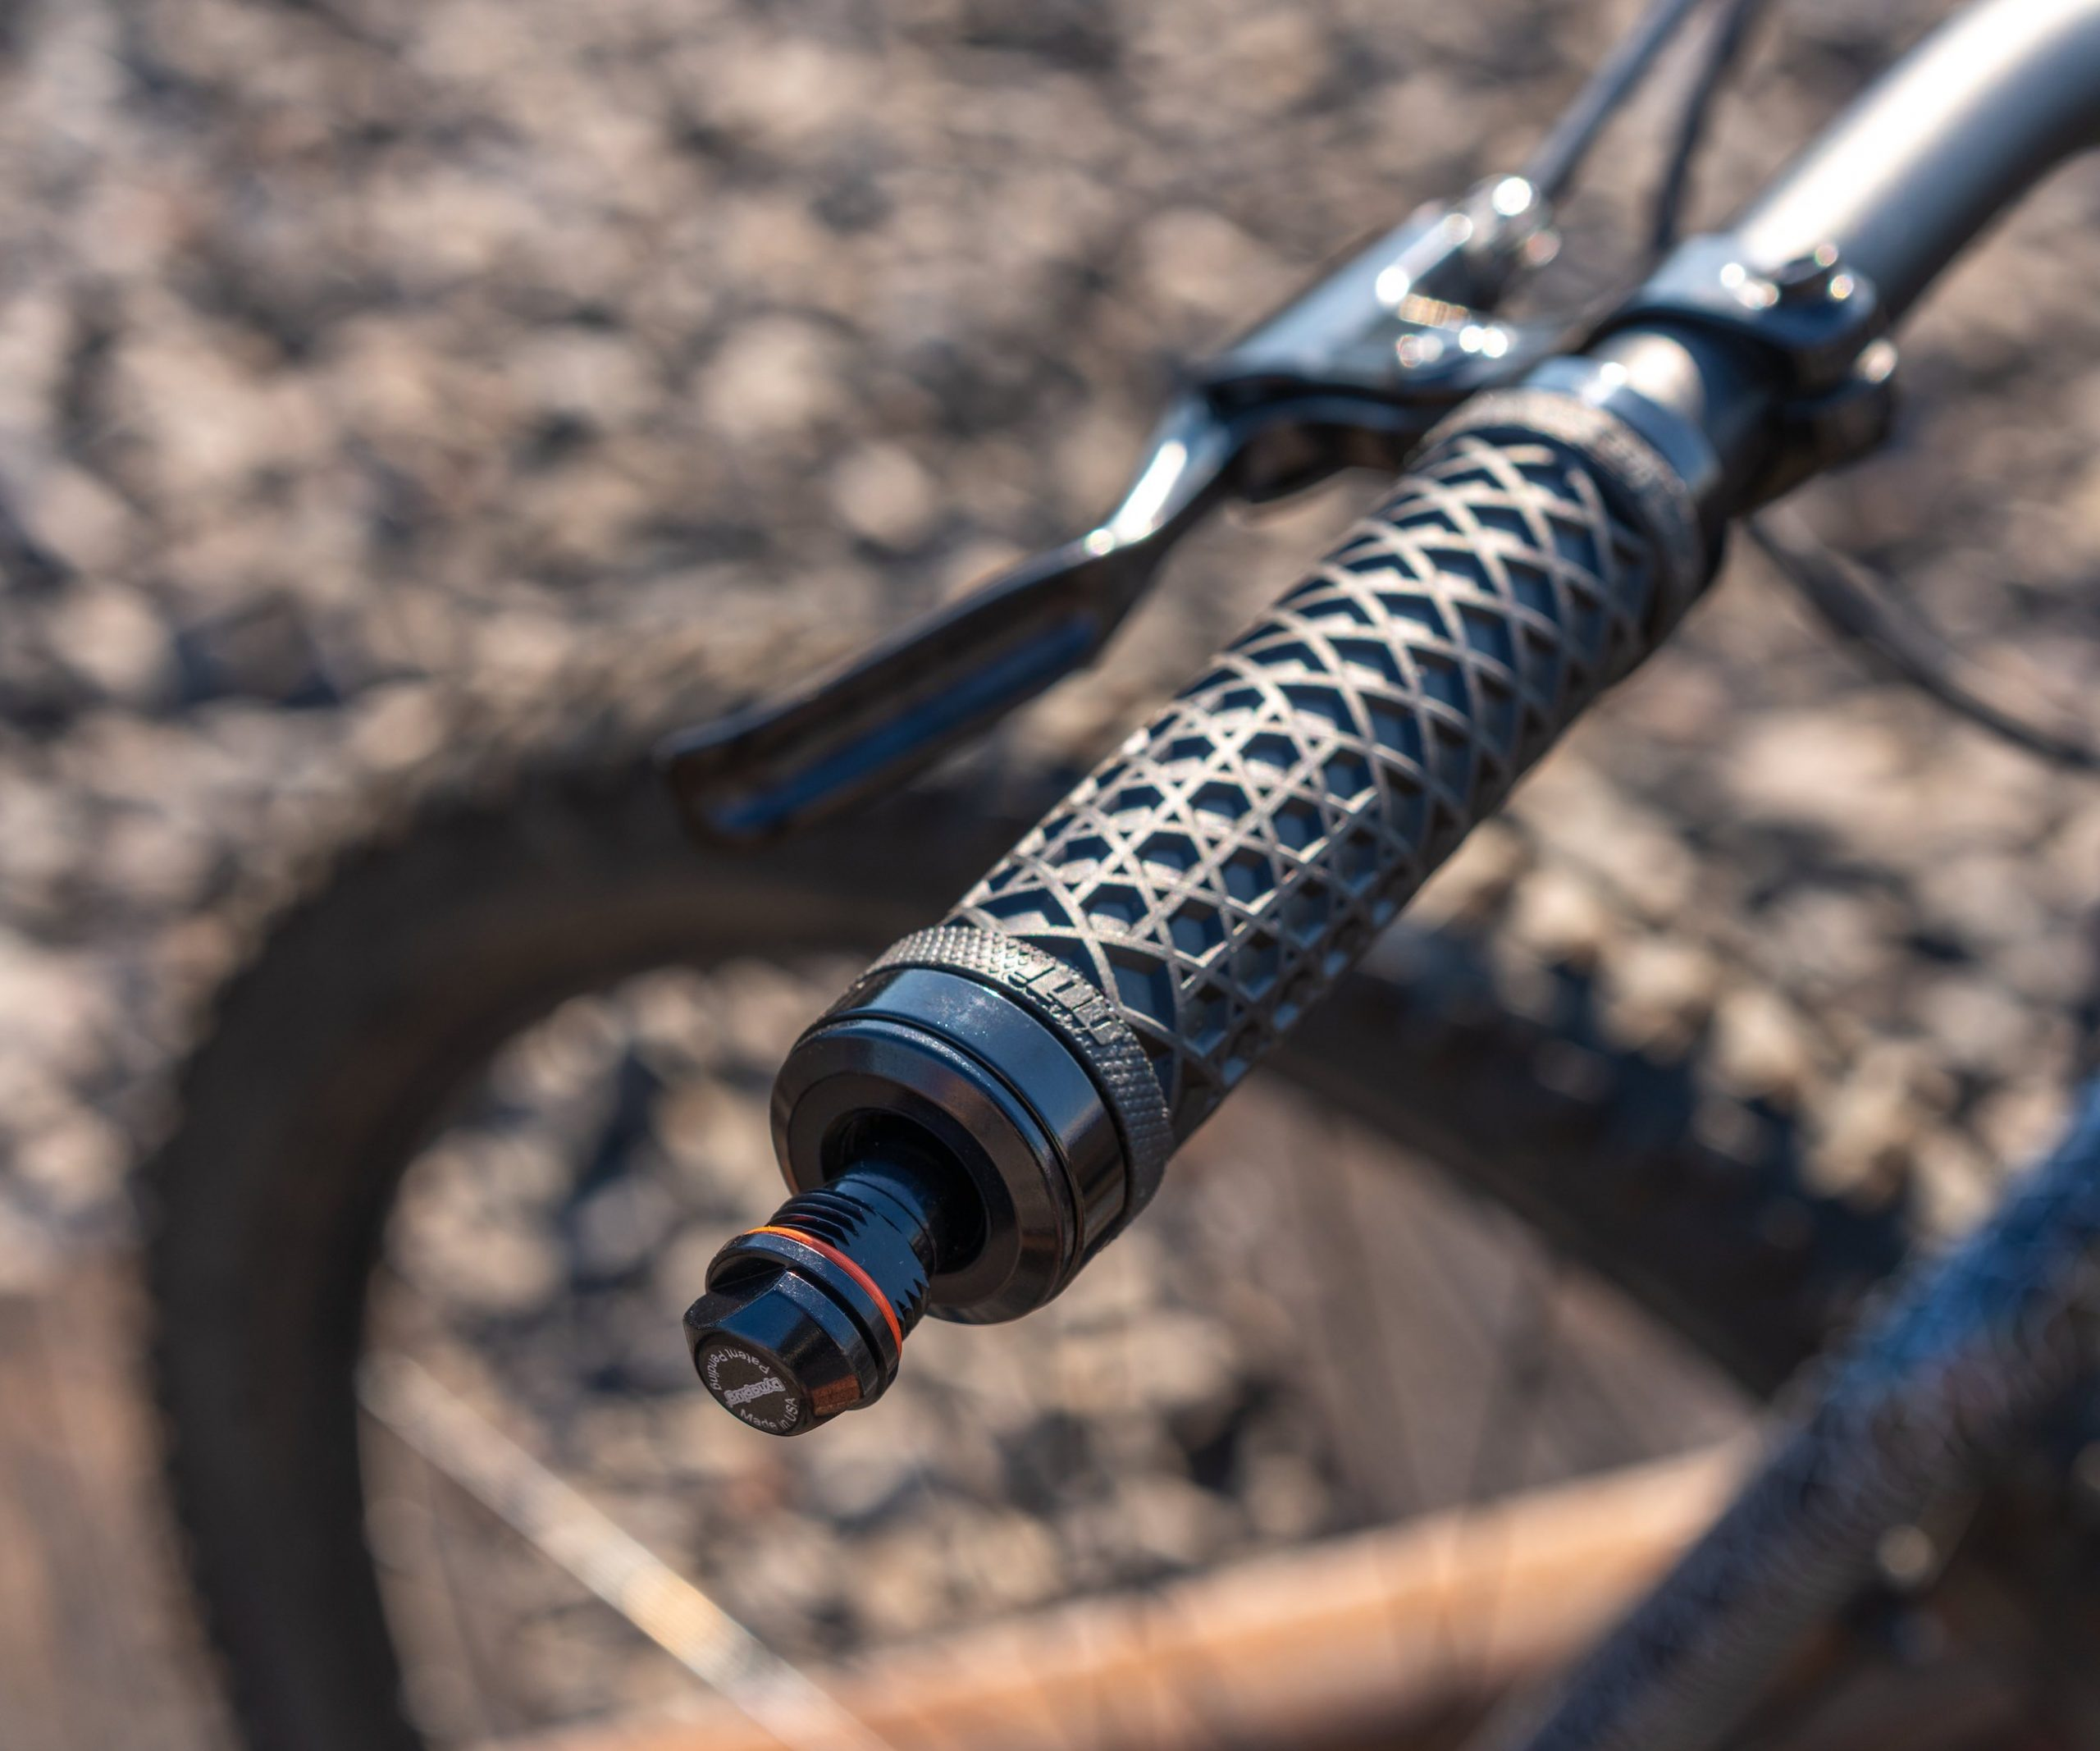 Dymanplug Covert Bar End Tubeless Repair Kit, Dynaplug Covert Bar End Tubeless Repair Kit